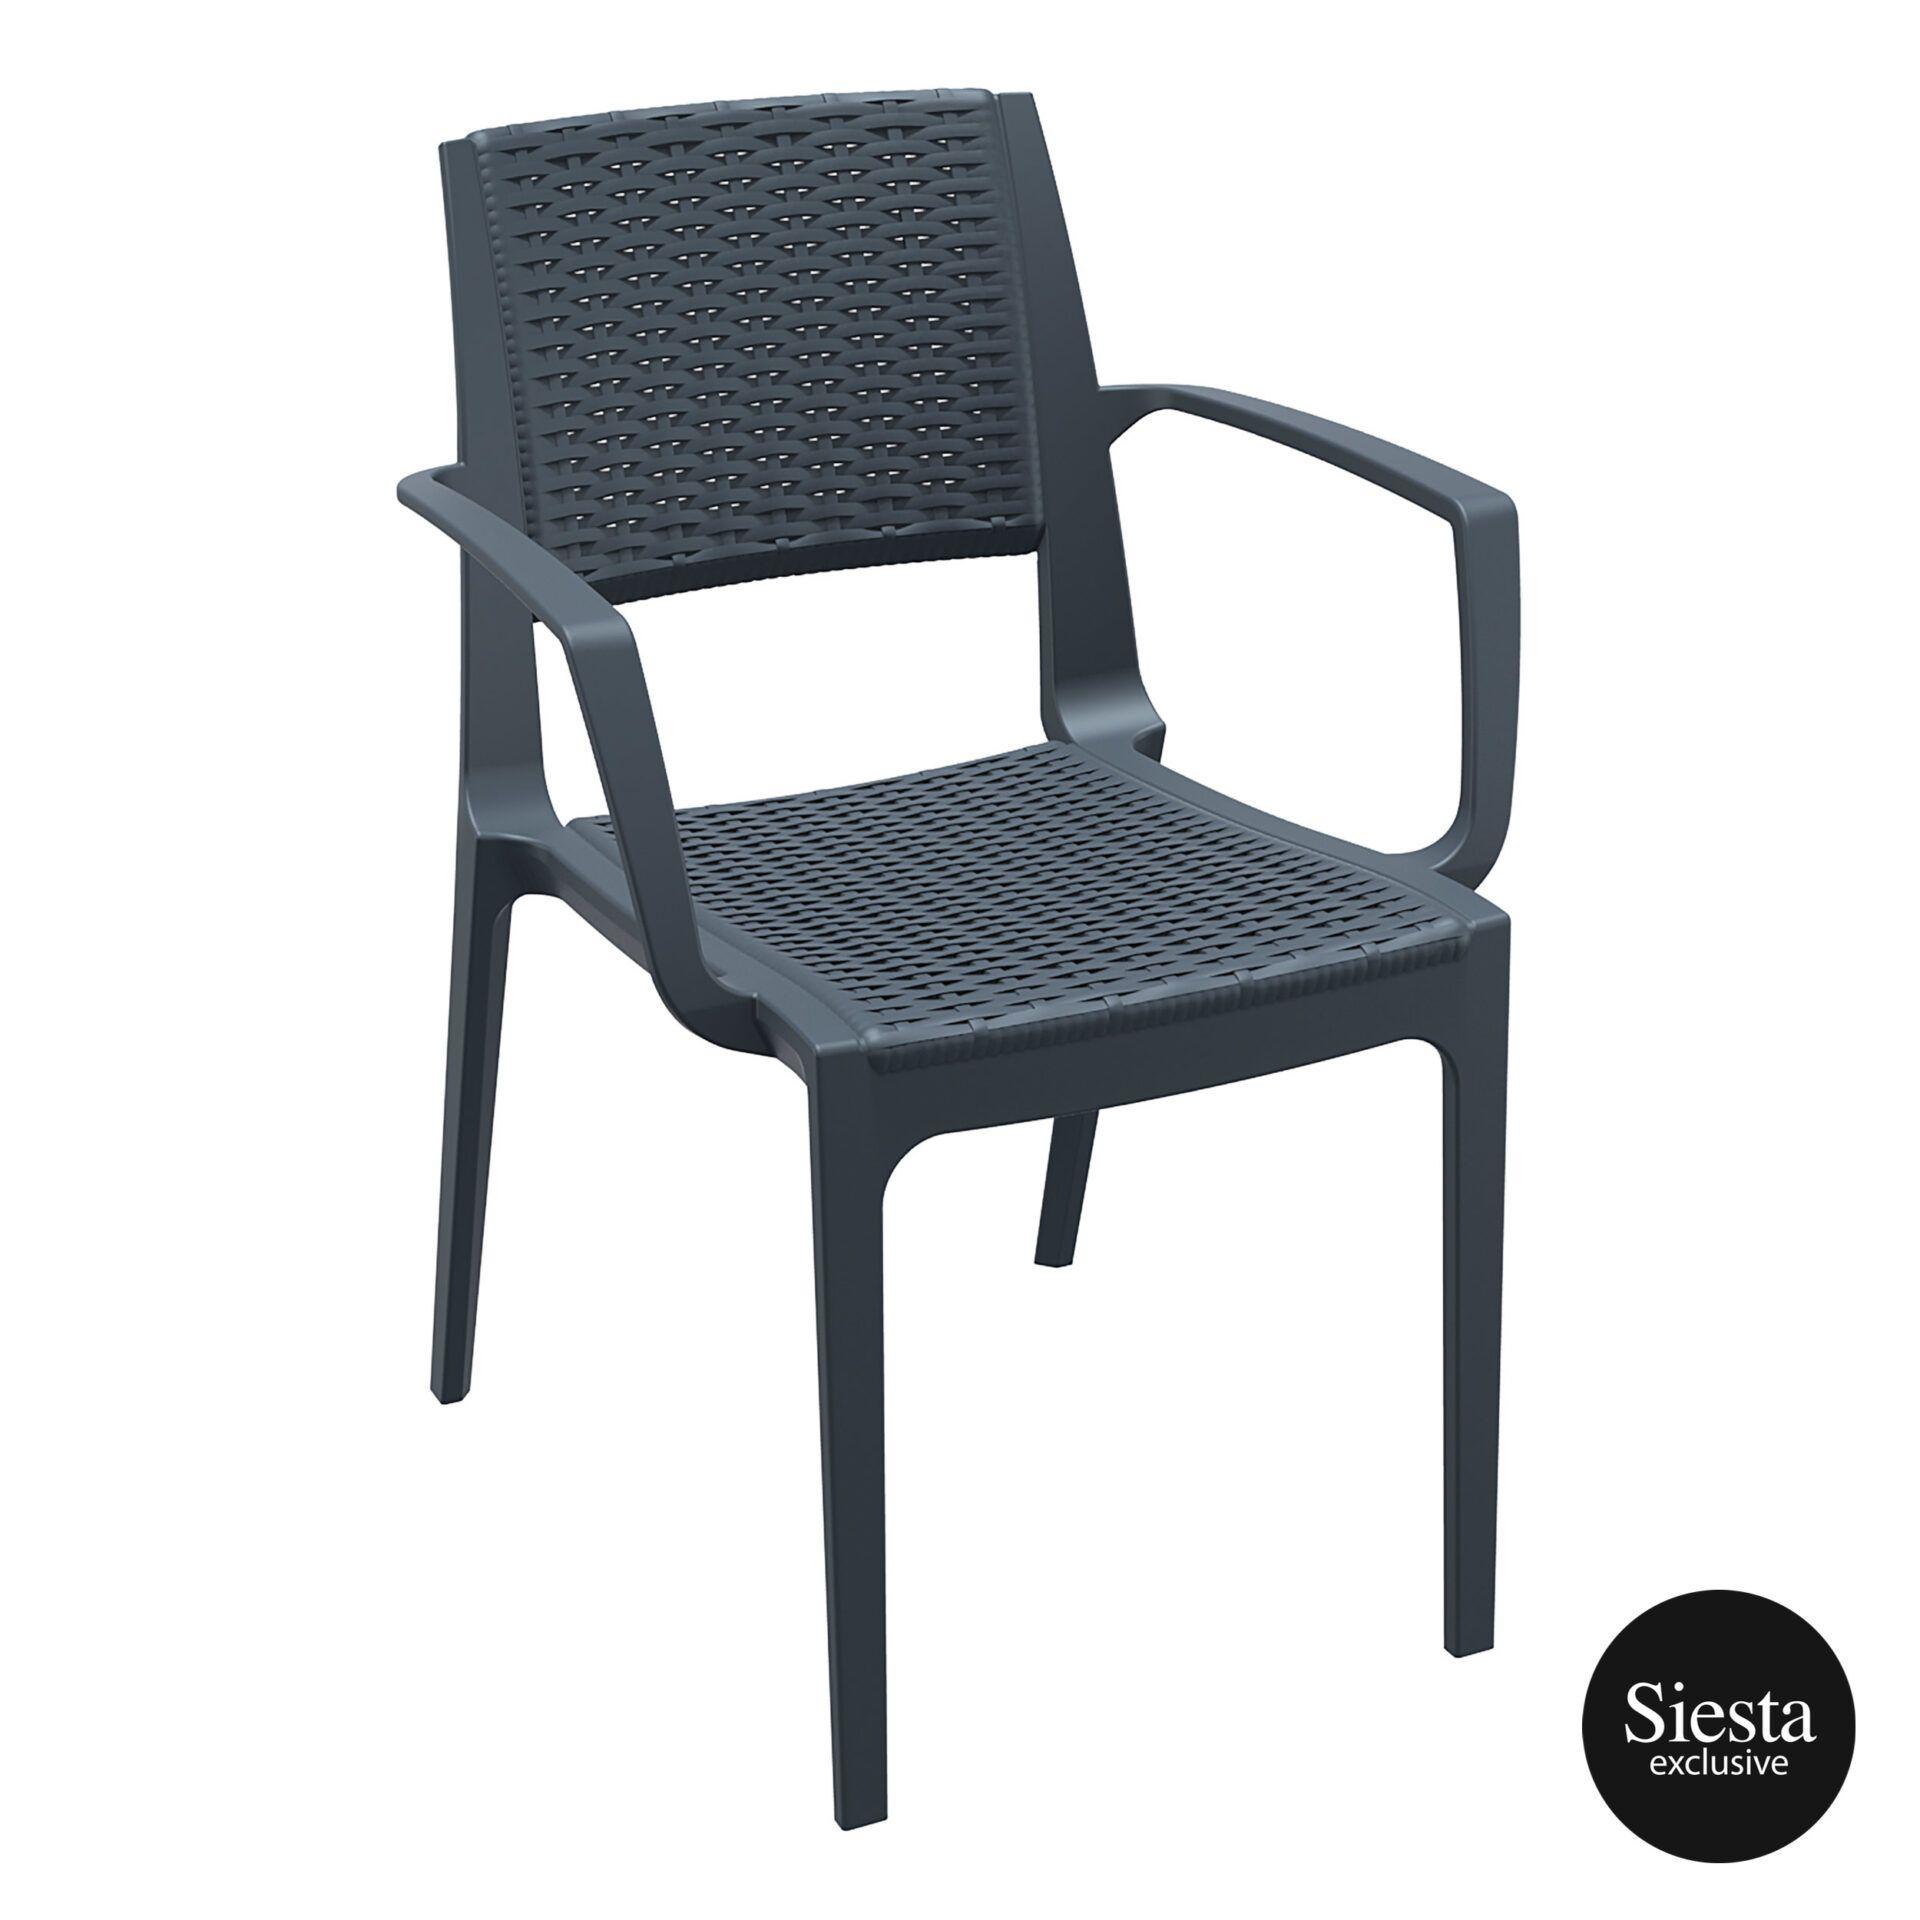 rattan outdoor seating capri chair darkgrey front side 1